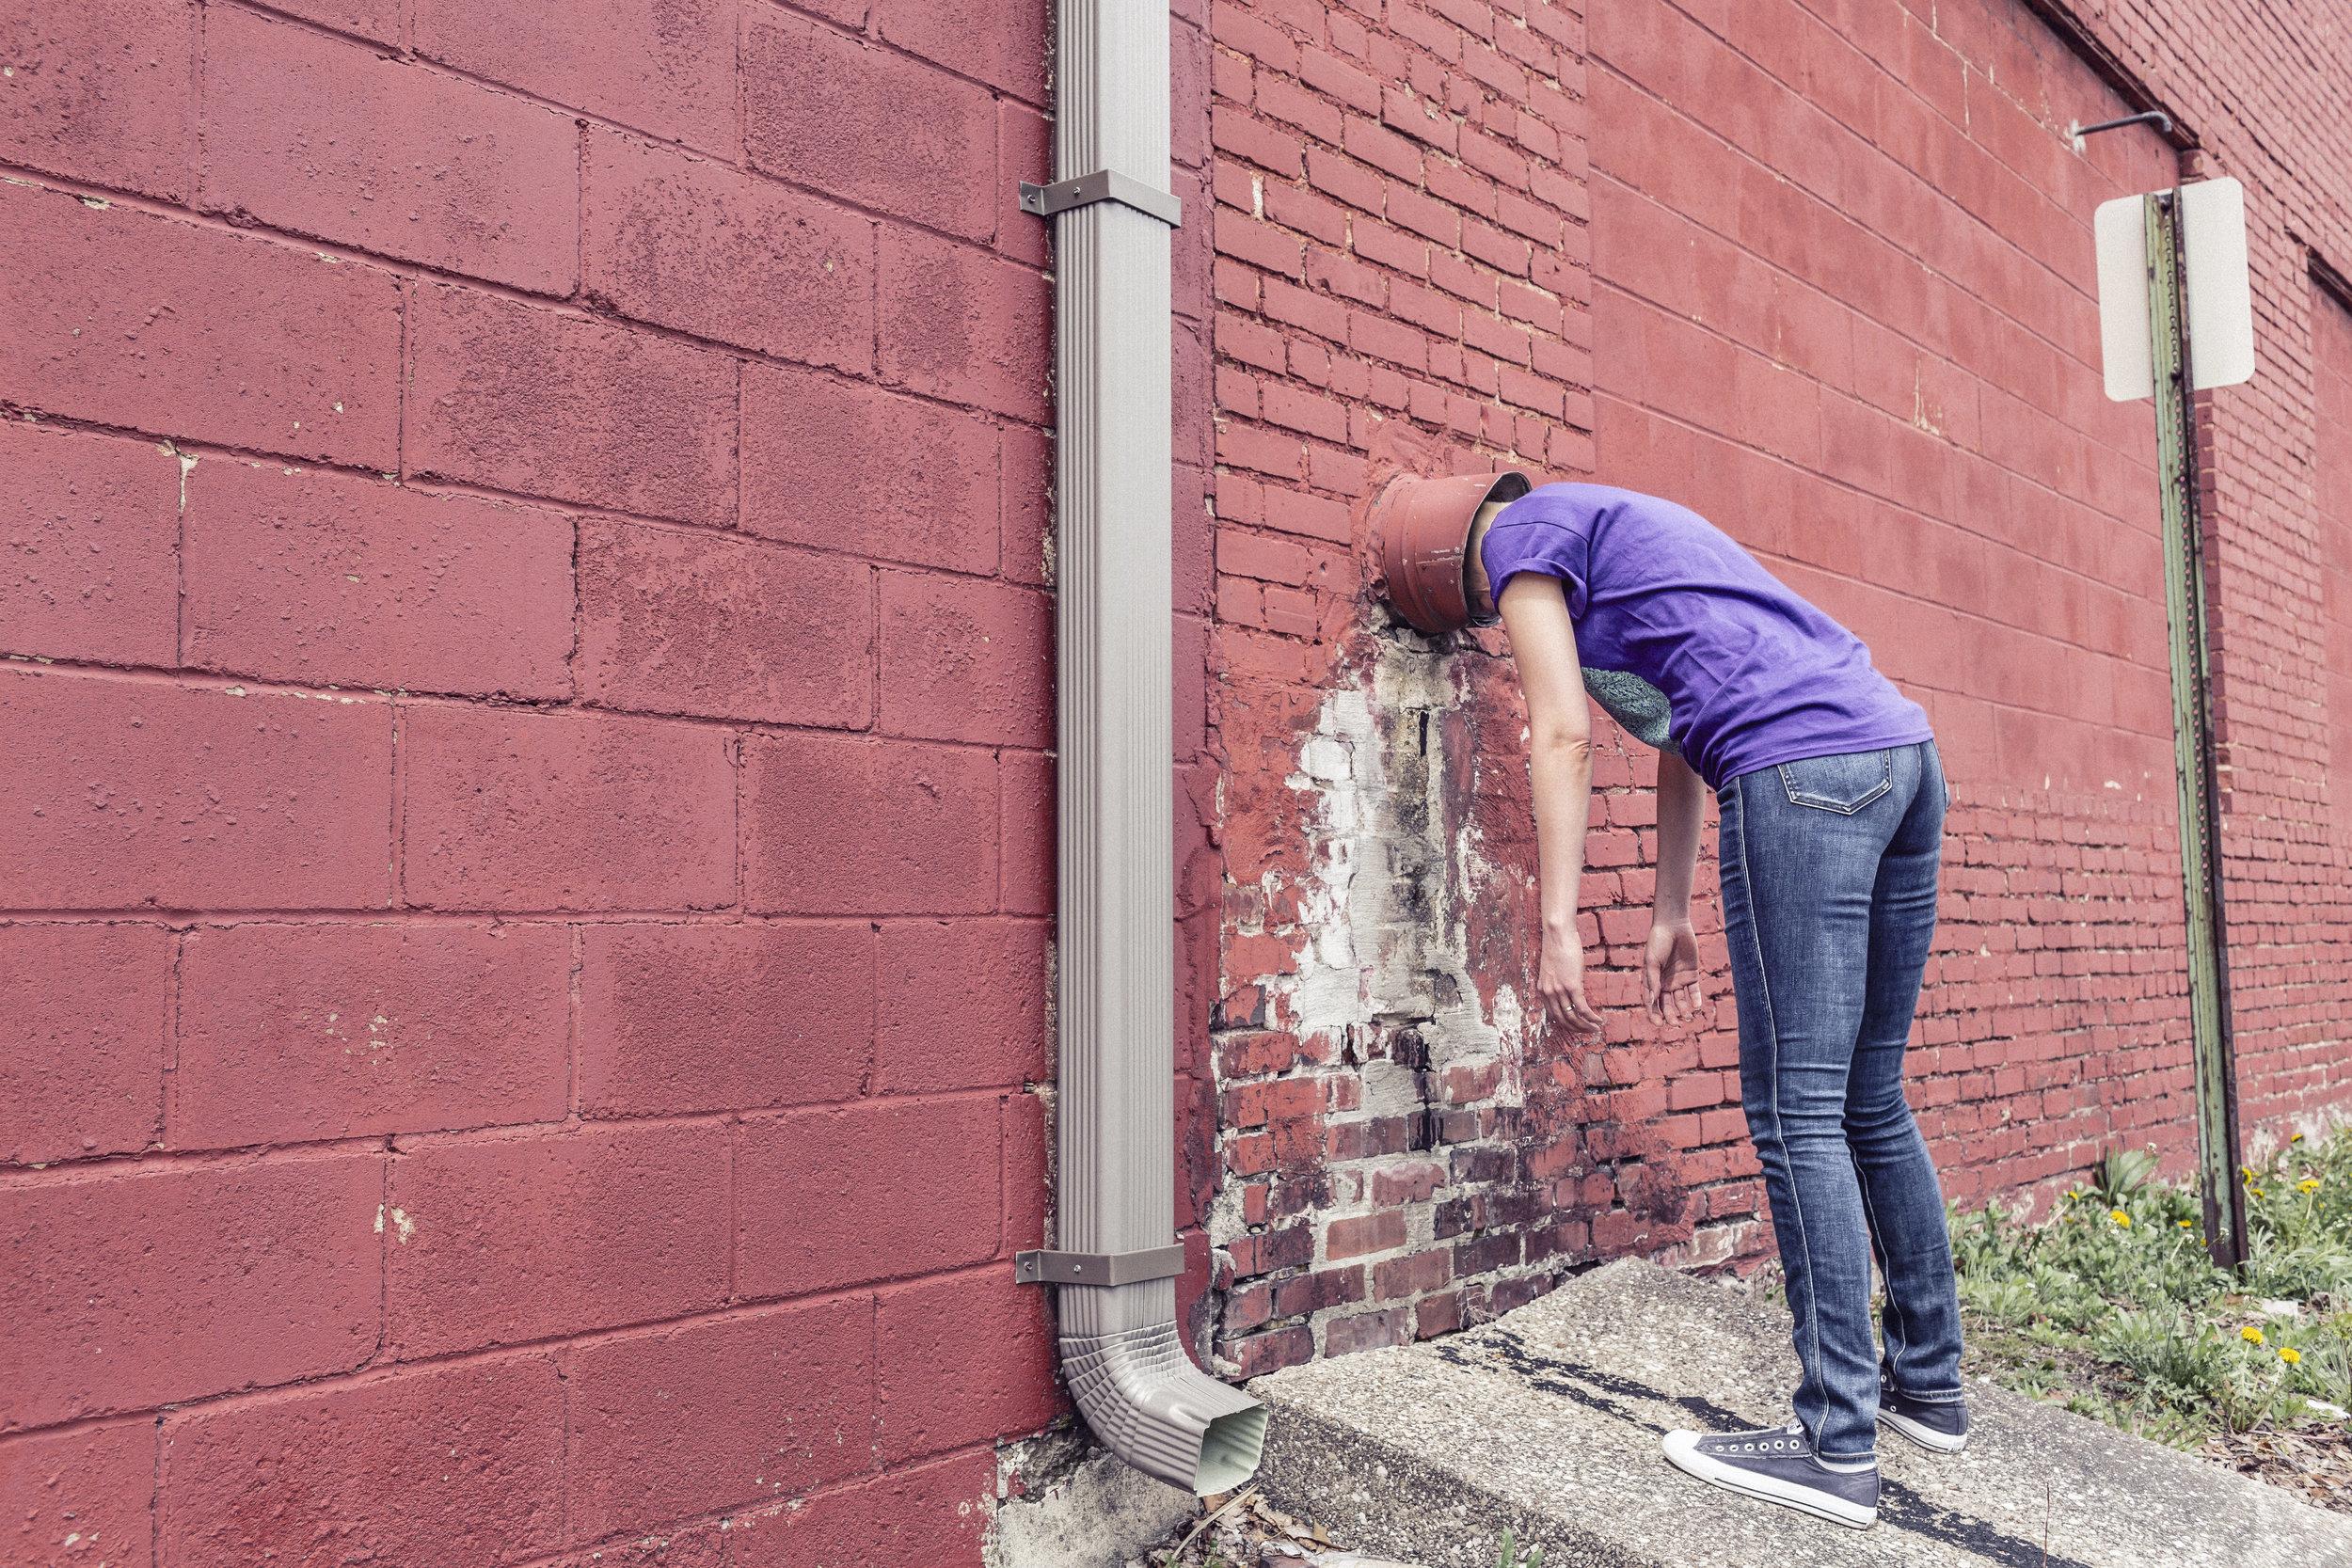 women against a wall